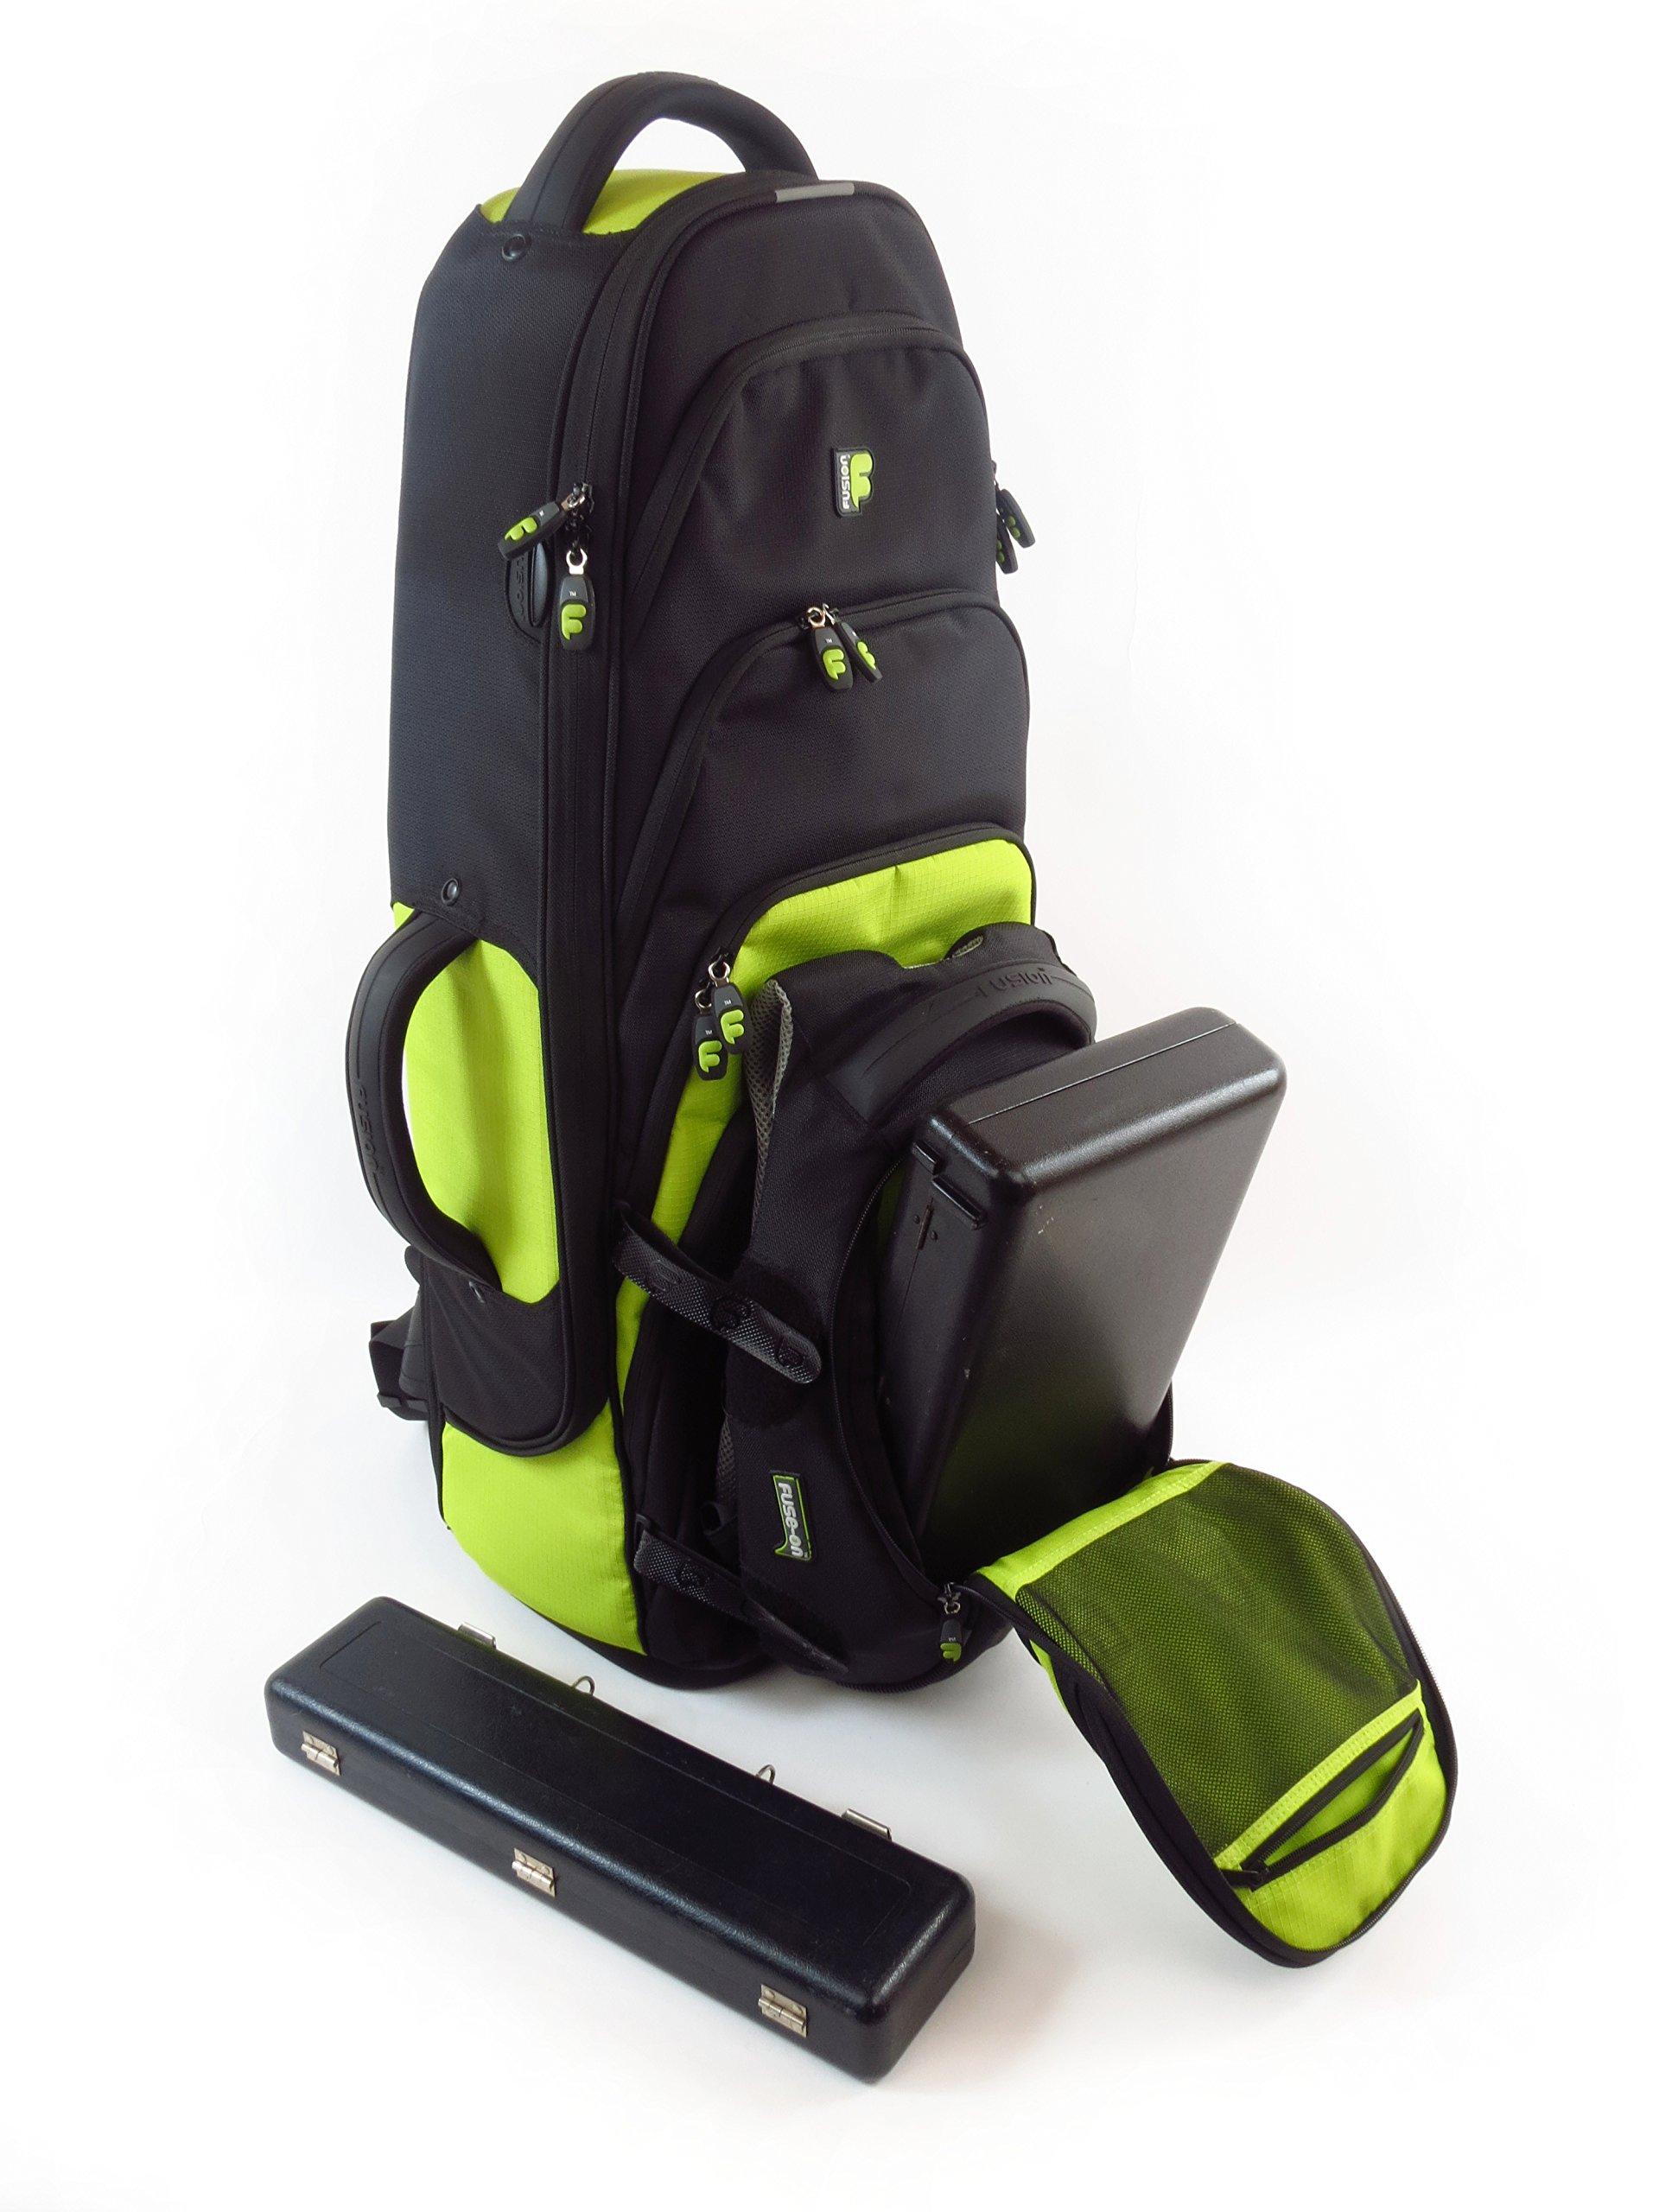 Fusion Premium Series (FB-PW-02-L) - Tenor Saxophone Gig Bag, Black/Lime by Fusion (Image #6)